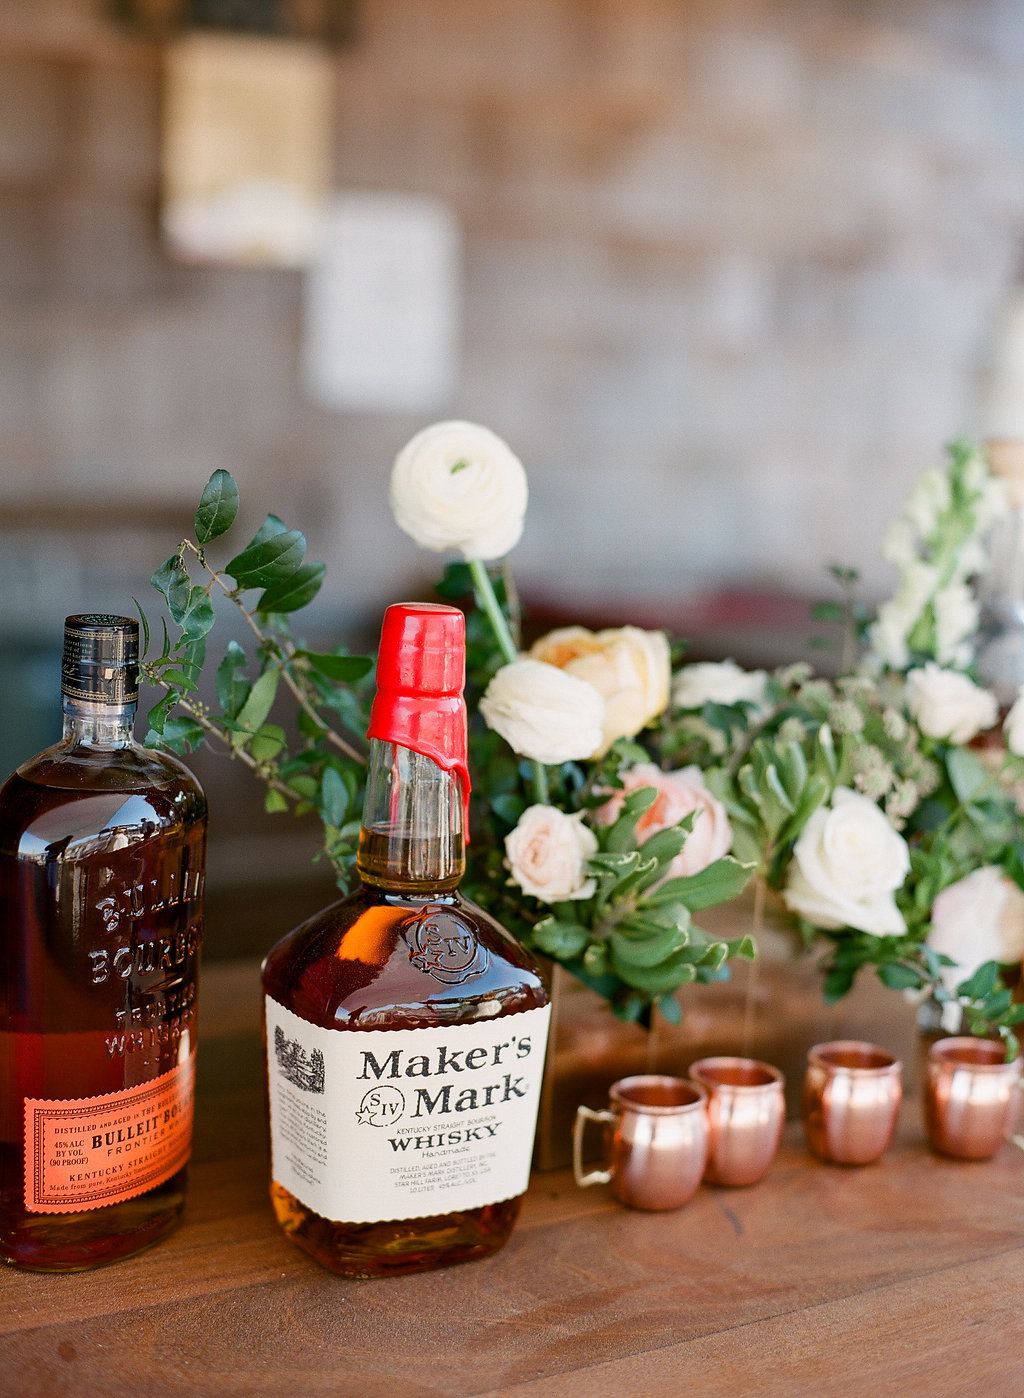 bourbon-whiskey-shot-bar-the-wyld-dock-bar-savannah-weddings-savannah-wedding-planner-savannah-event-designer-savannah-wedding-florist.jpg